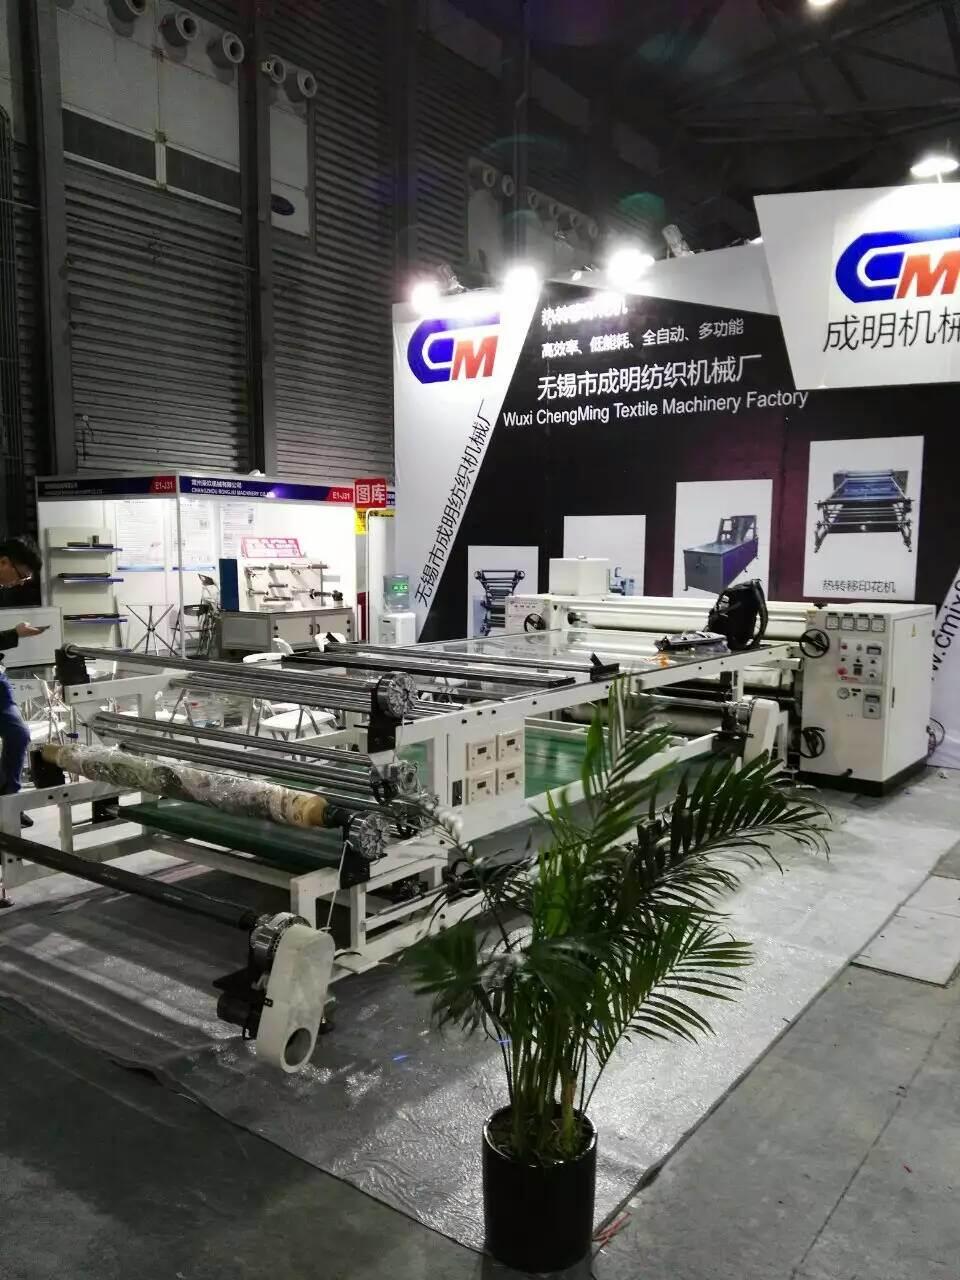 Personal Custonmized Heat Transfer Printing Machine